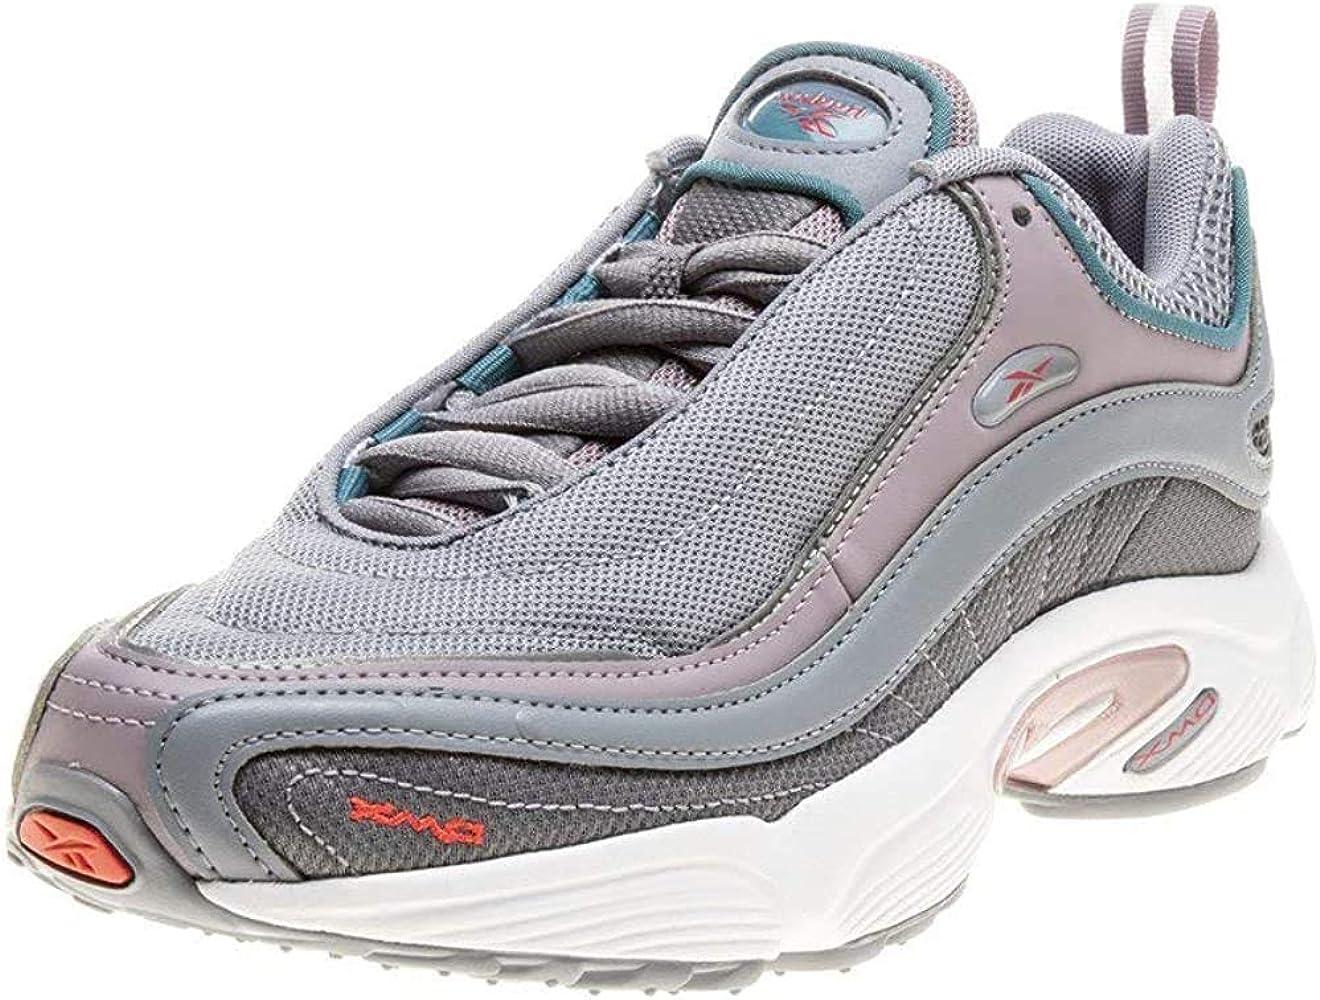 Reebok Daytona Dmx Womens Sneakers Grey